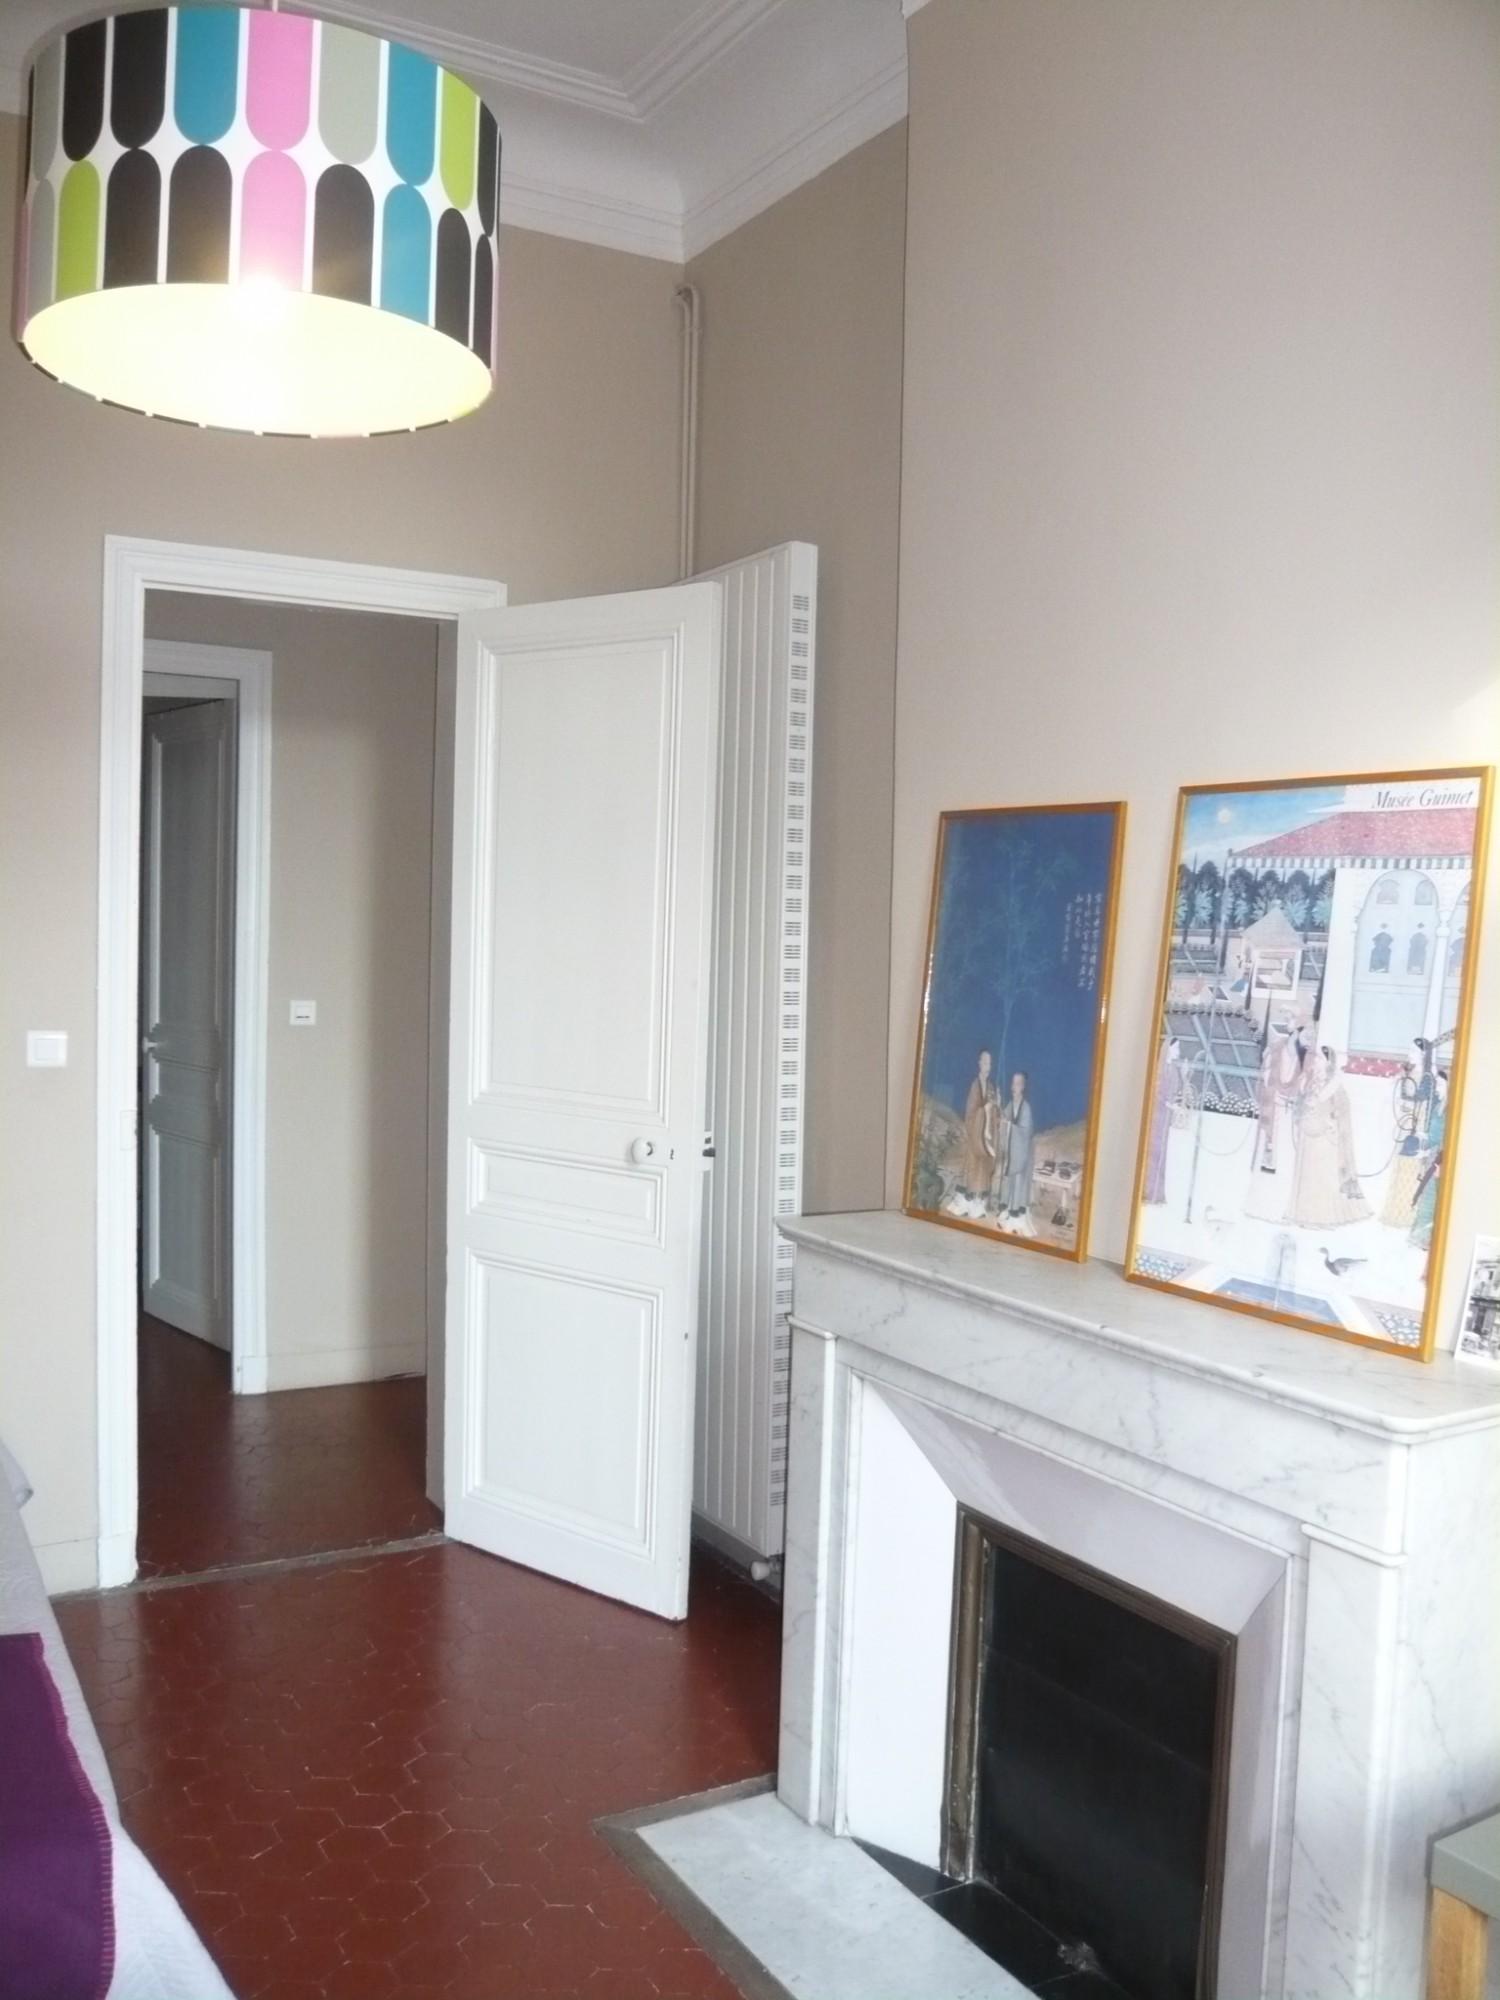 Ventes Appartement T3 F3 Marseille Rue Colbert proximité